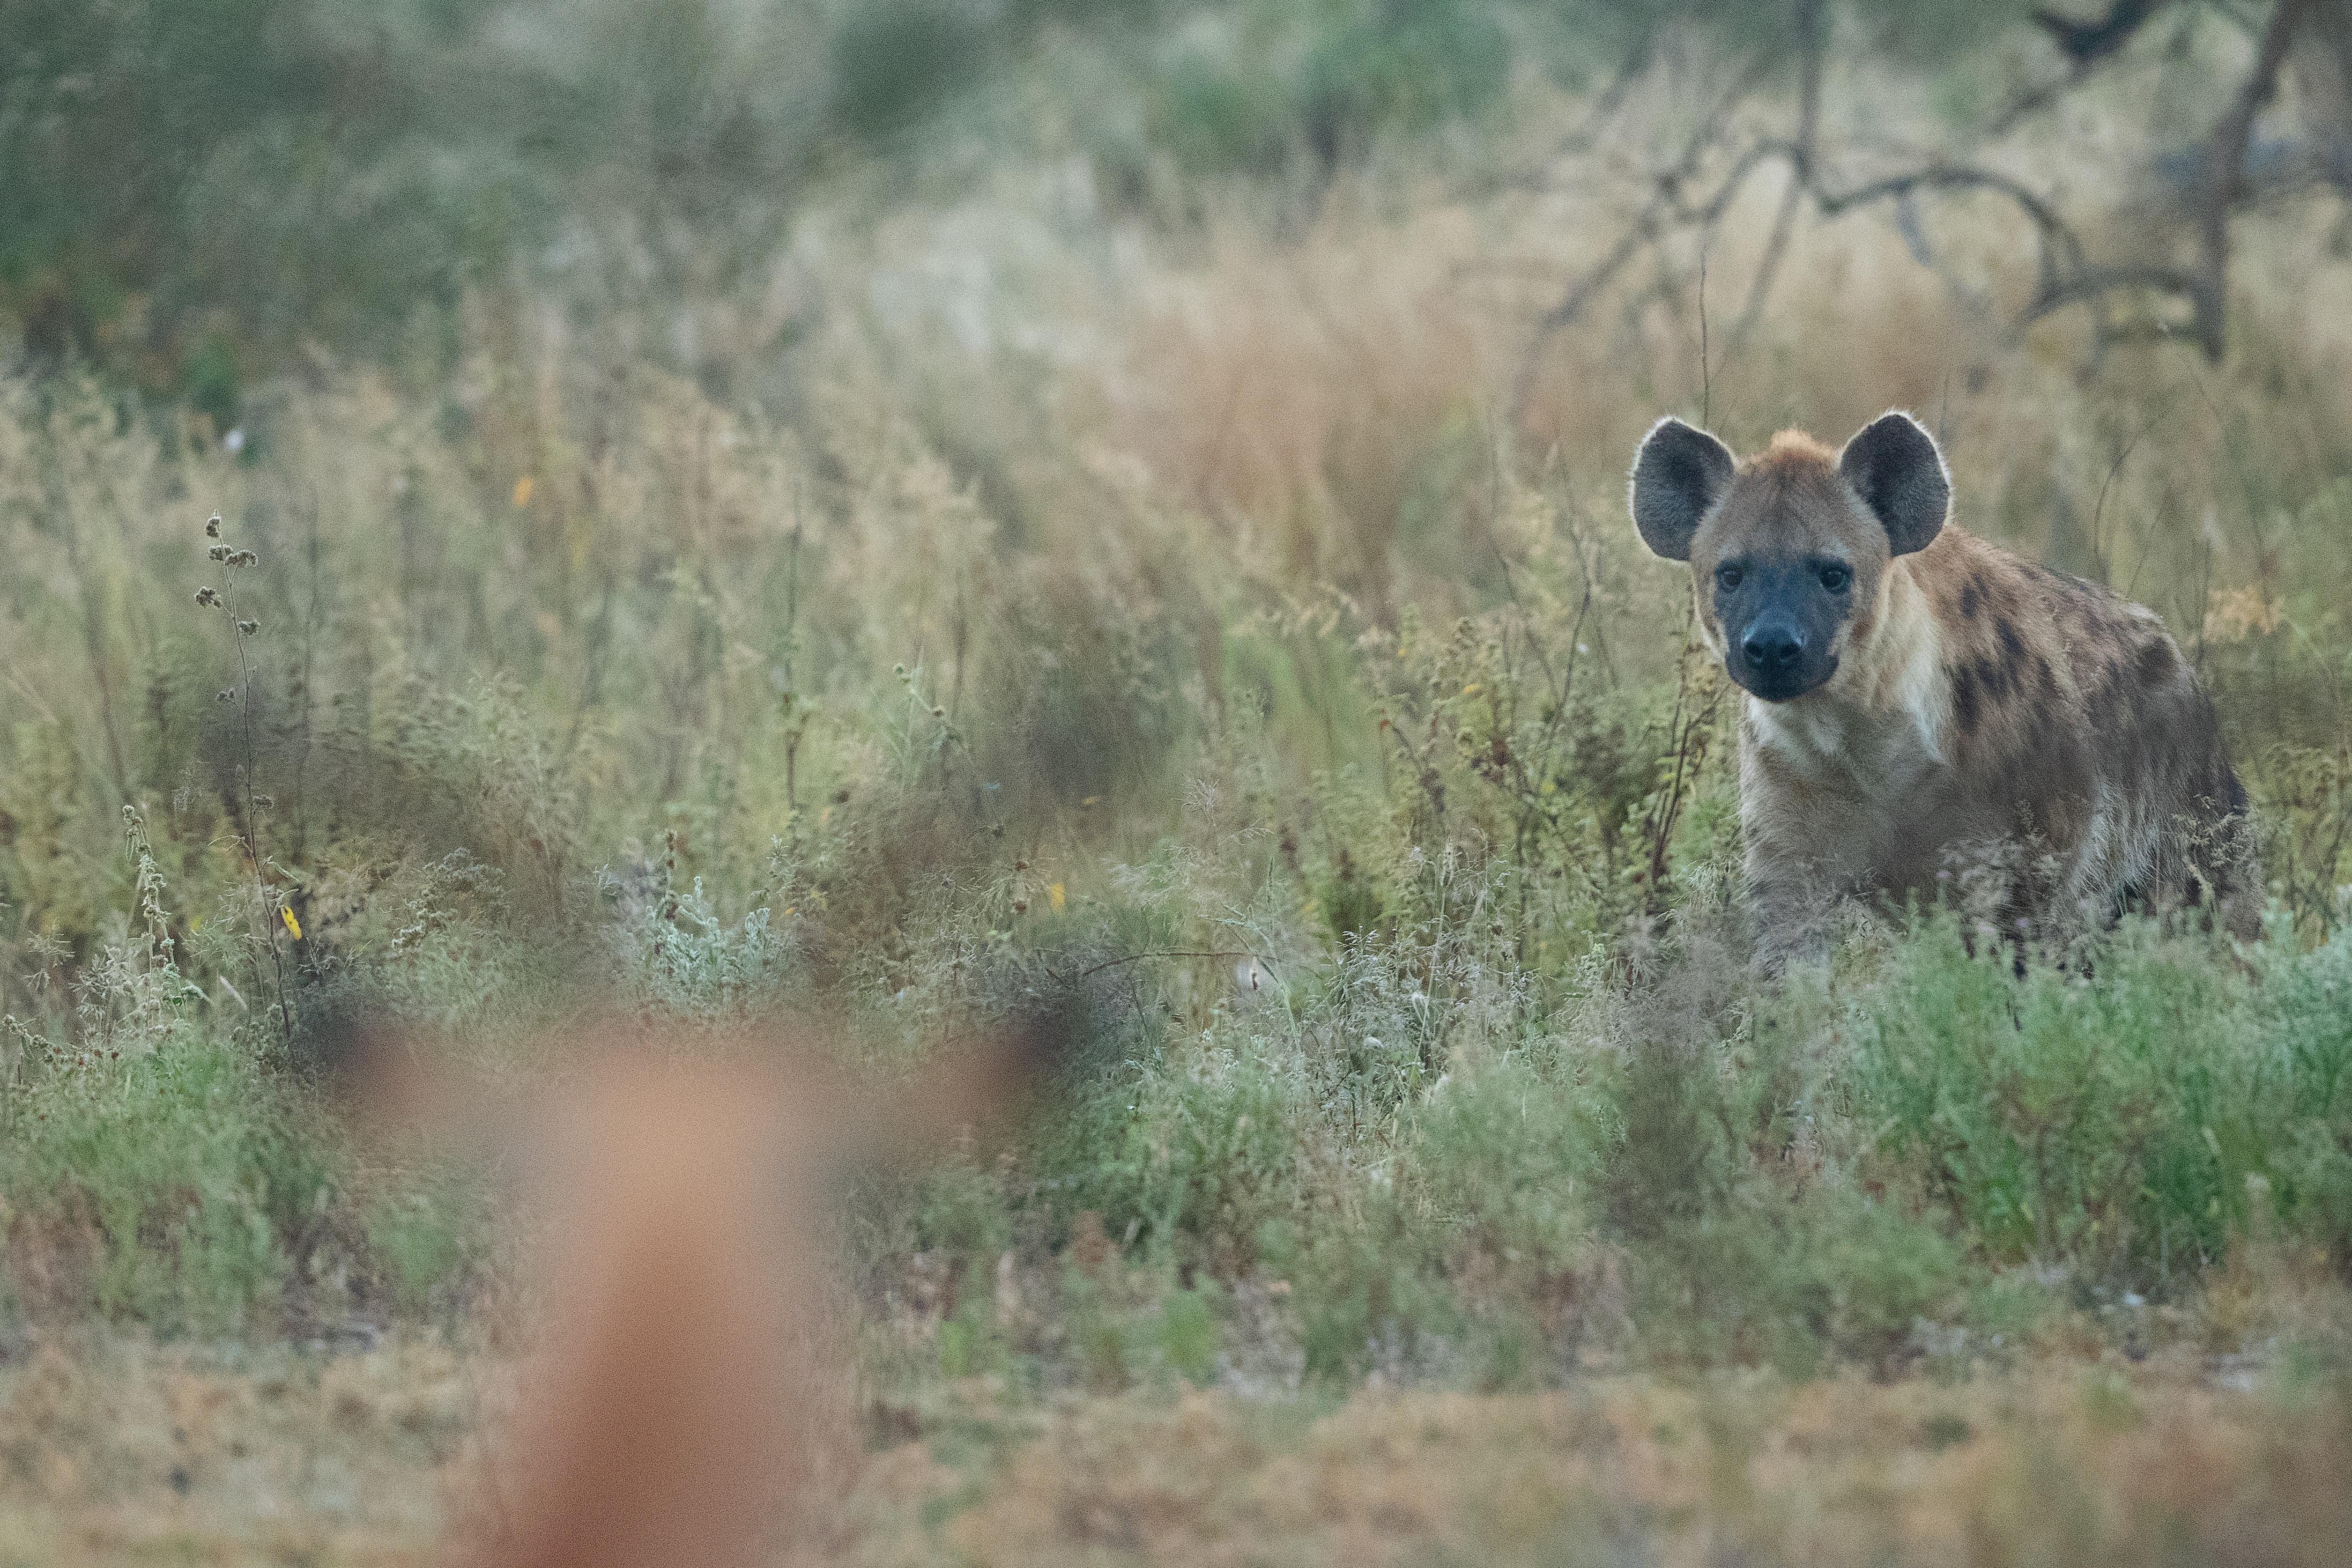 Hyena on grass